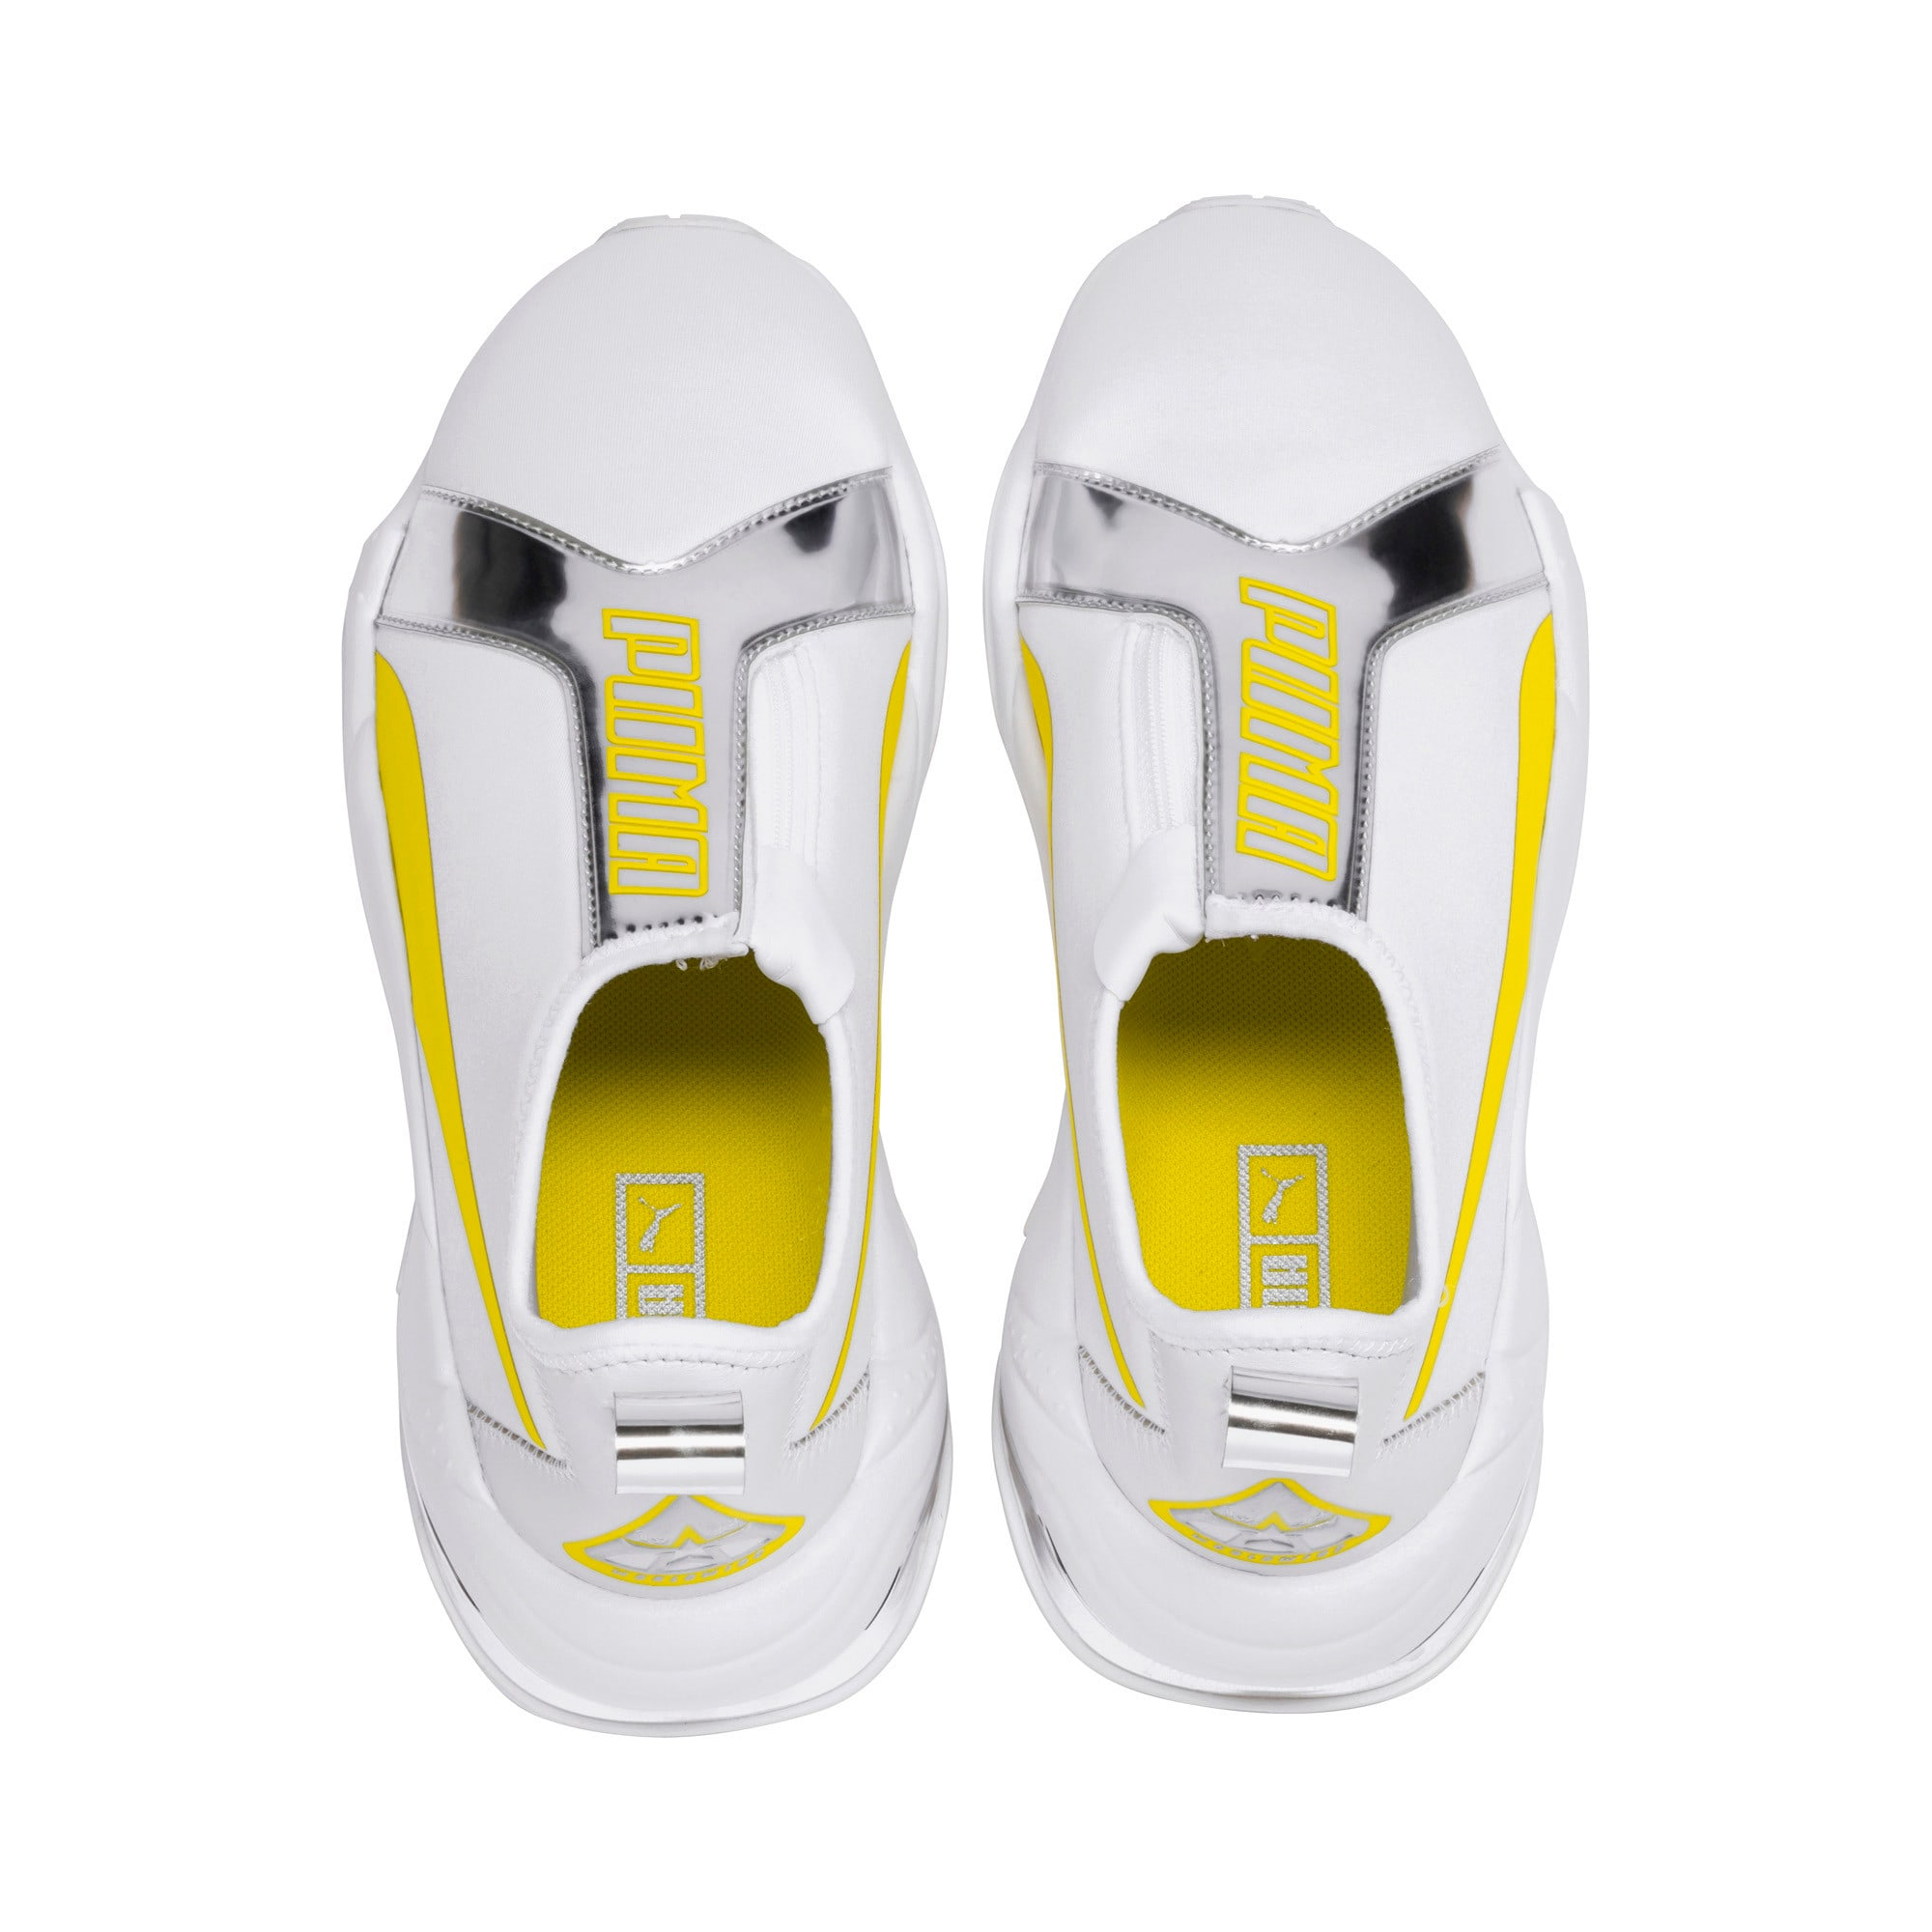 Miniatura 7 de Zapatos deportivos para mujer Thunder TrailblazerMetallic, Puma White-Blazing Yellow, mediano